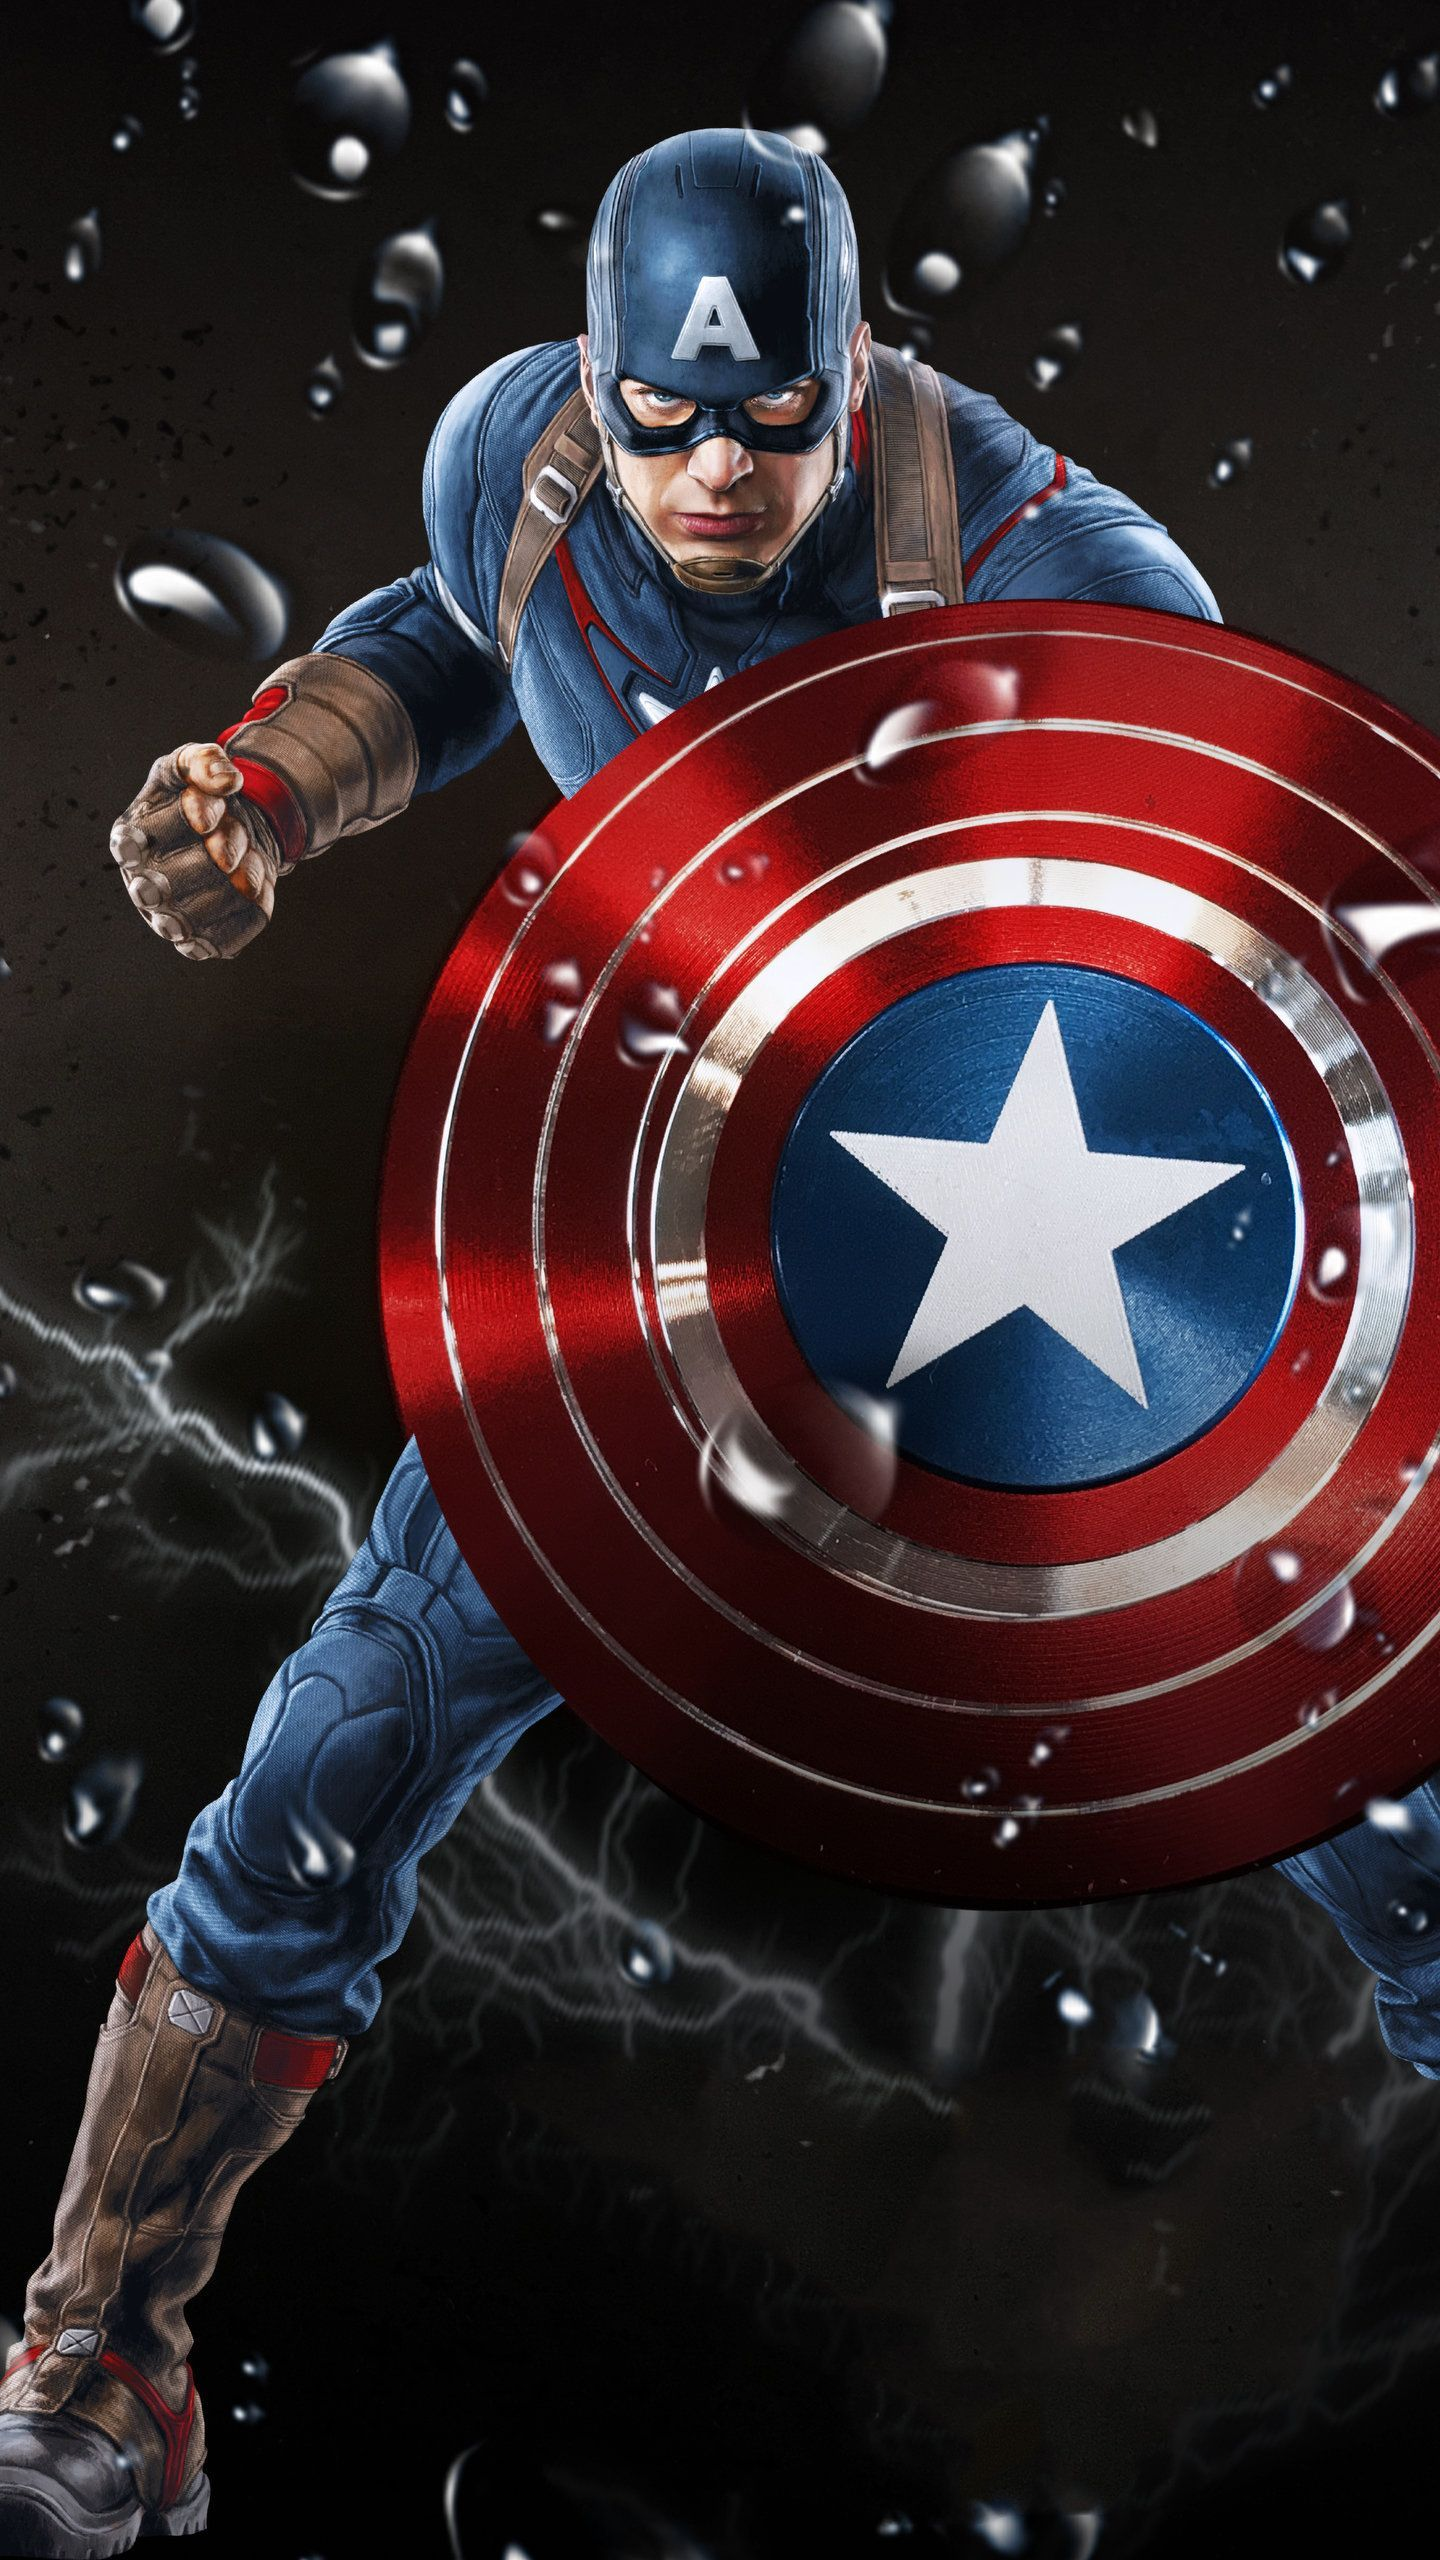 Captain America Wallpaper 4k Hd In 2020 Captain America Wallpaper Captain America Art Superhero Wallpaper